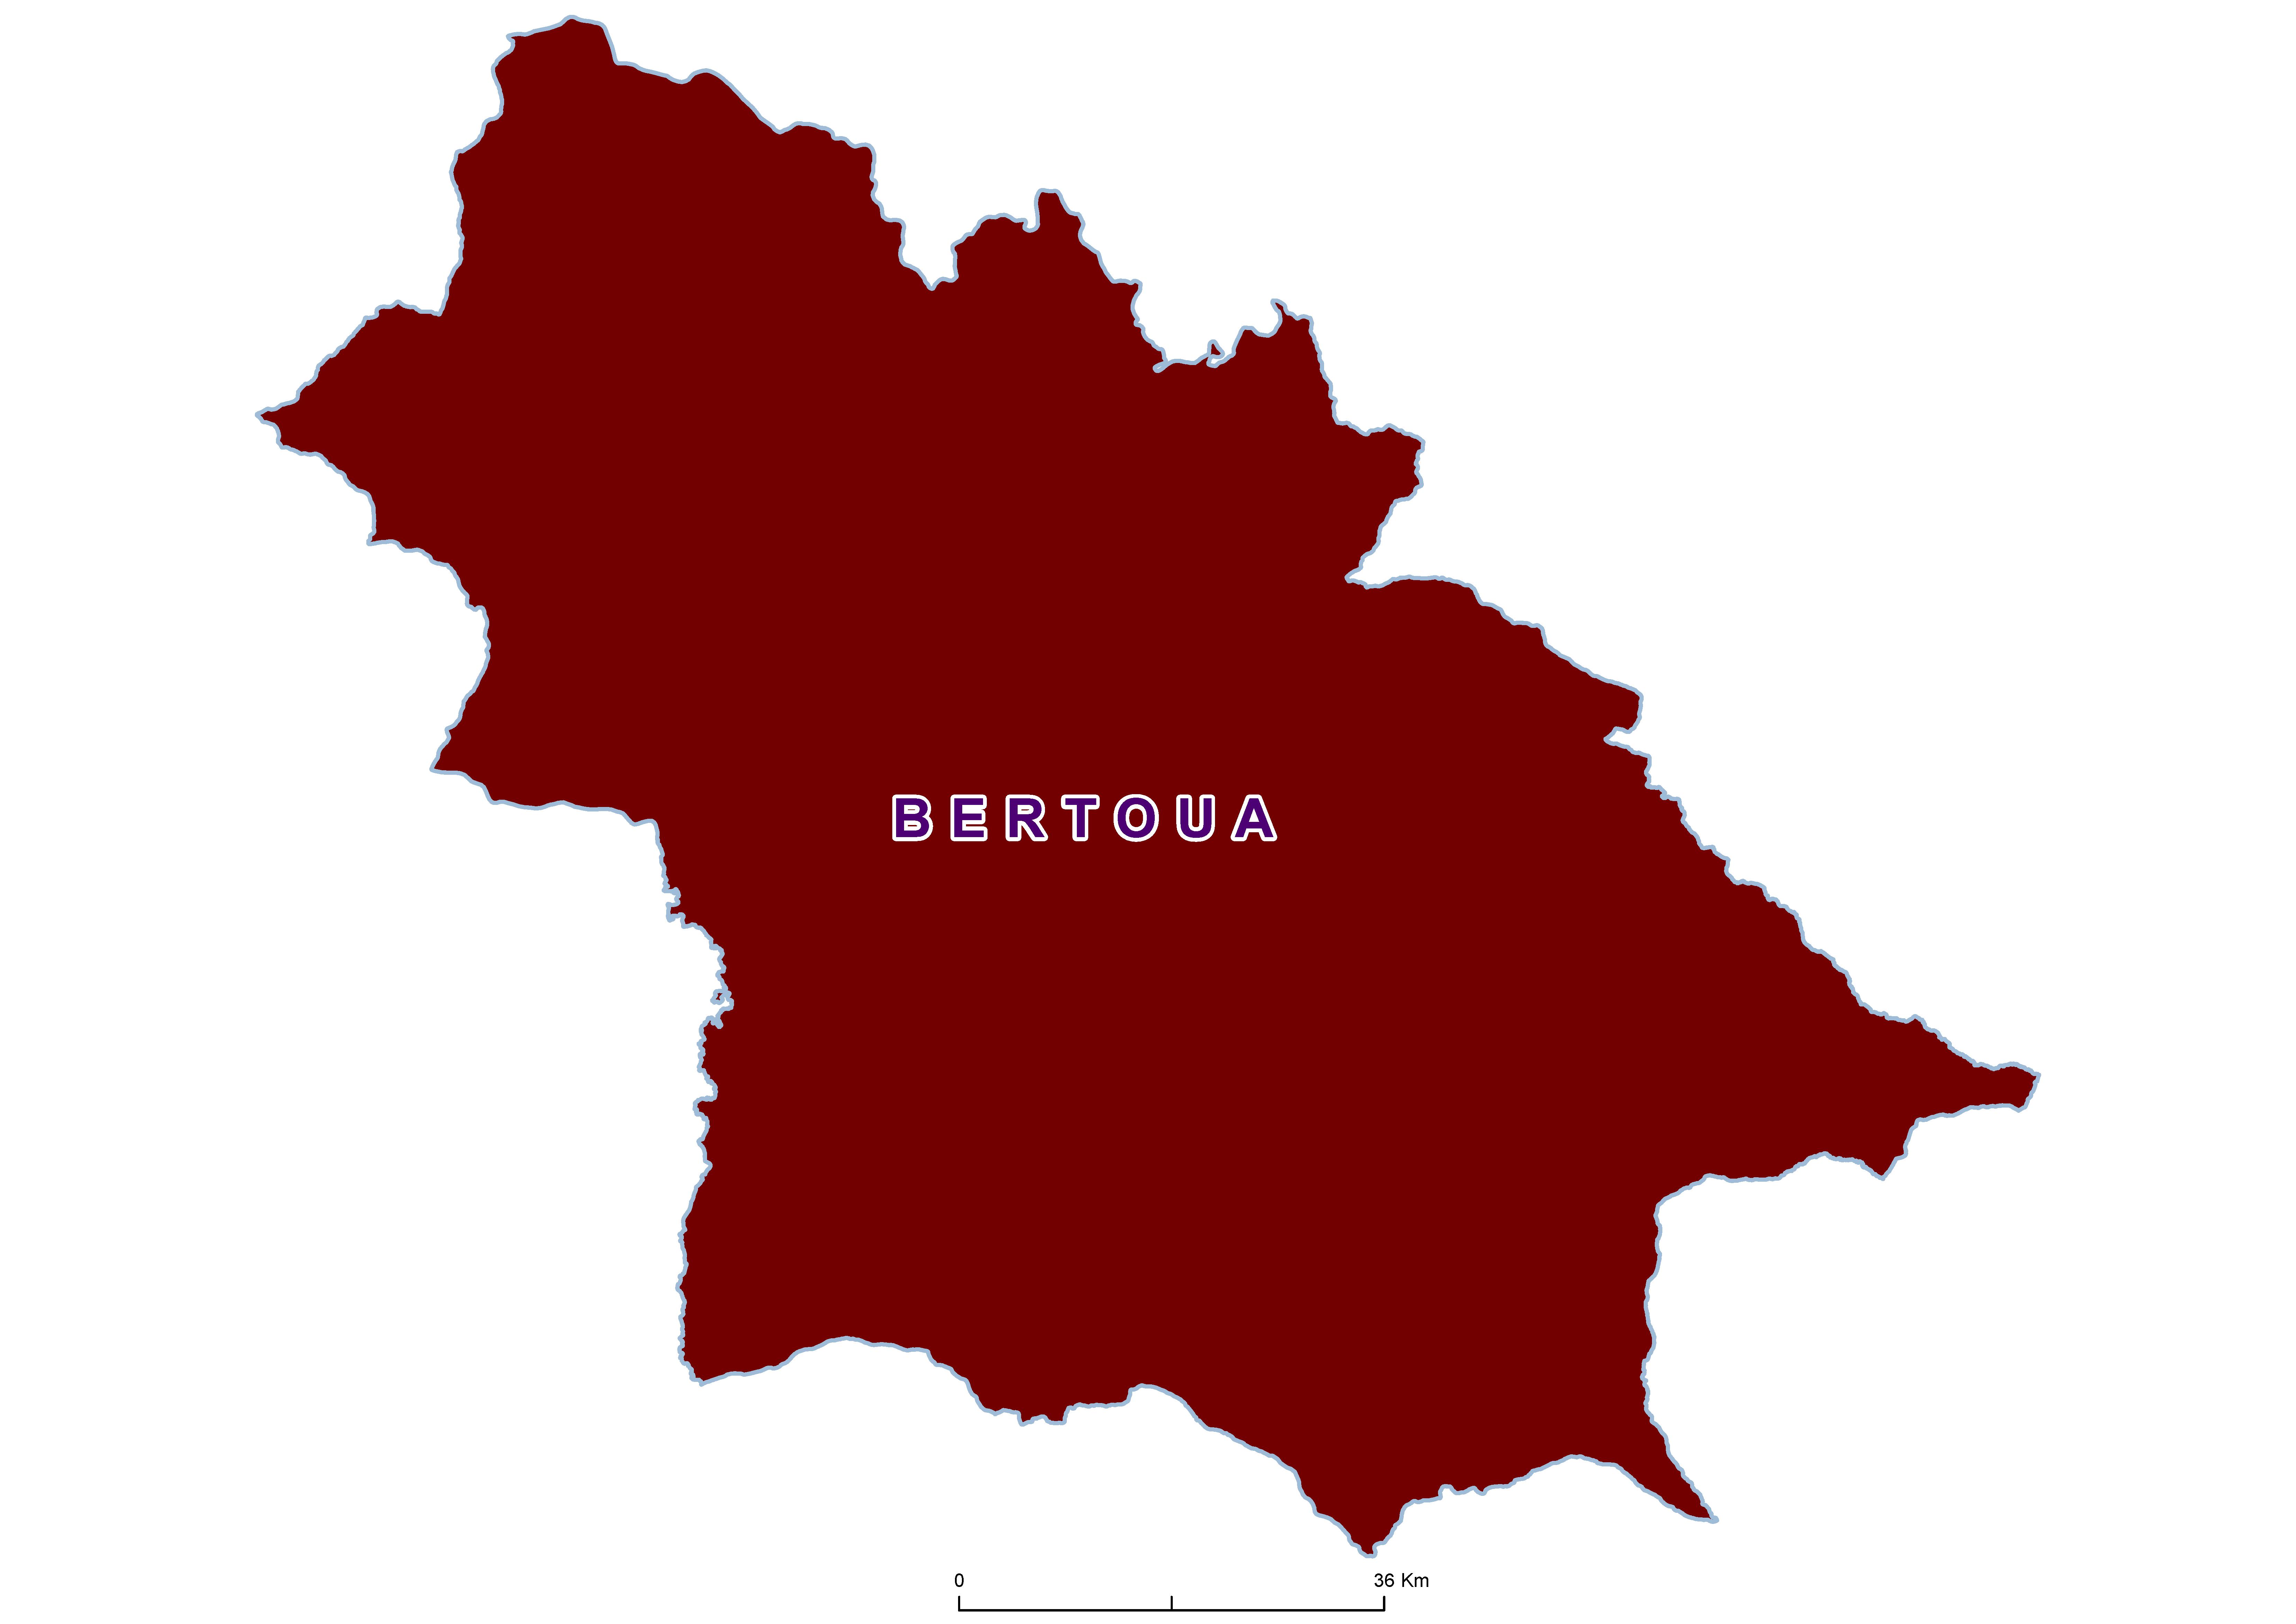 Bertoua Max STH 19850001